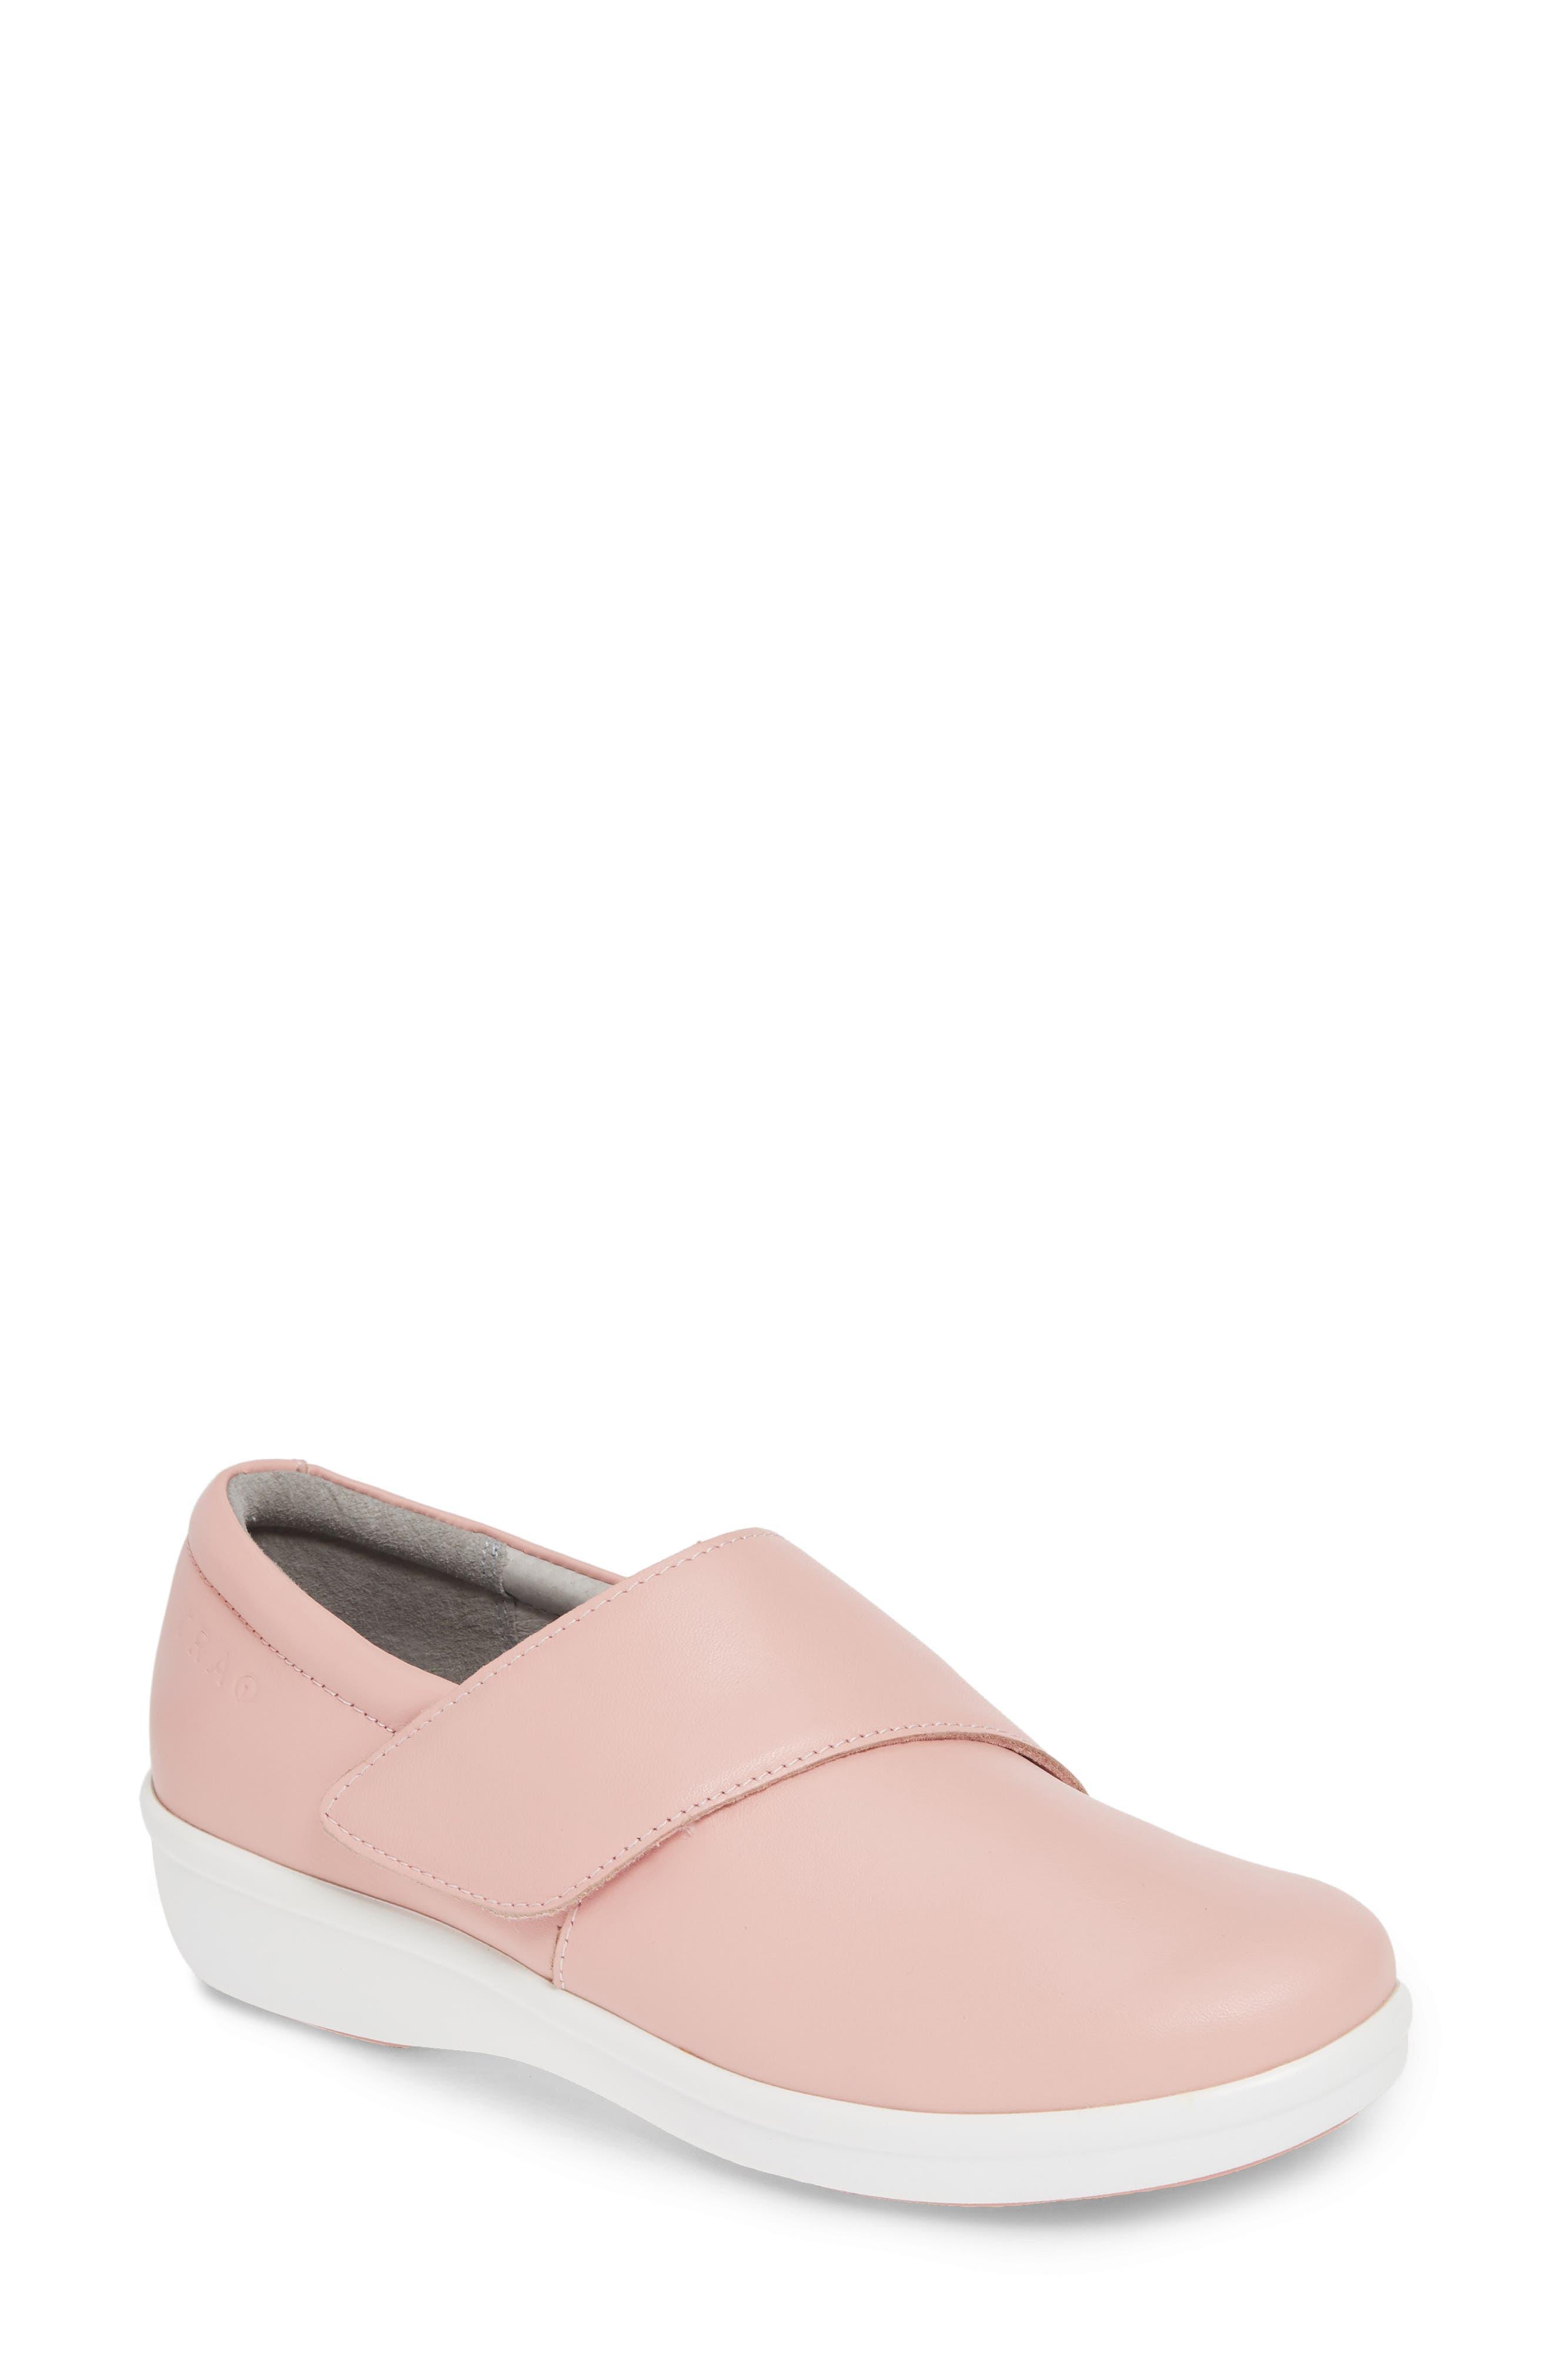 Alegria Qin Slip-On, Pink